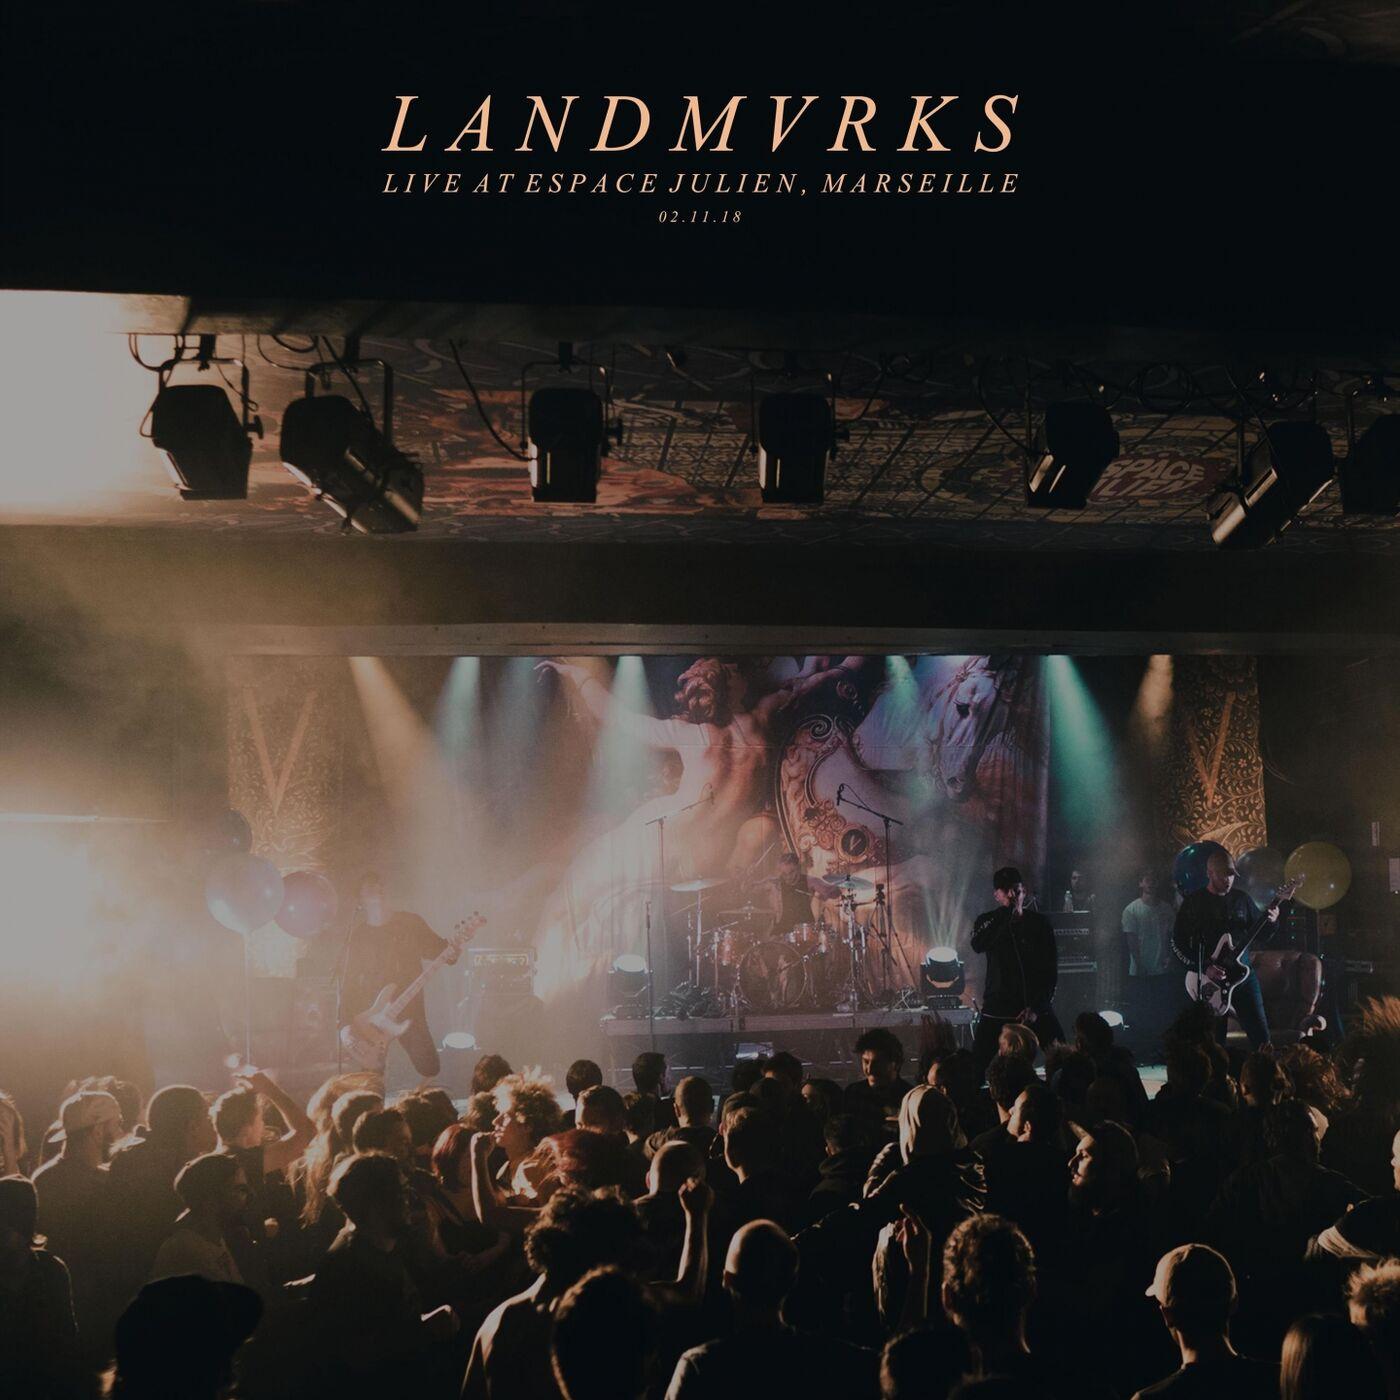 LANDMVRKS - Live at Espace Julien, Marseille (2019)